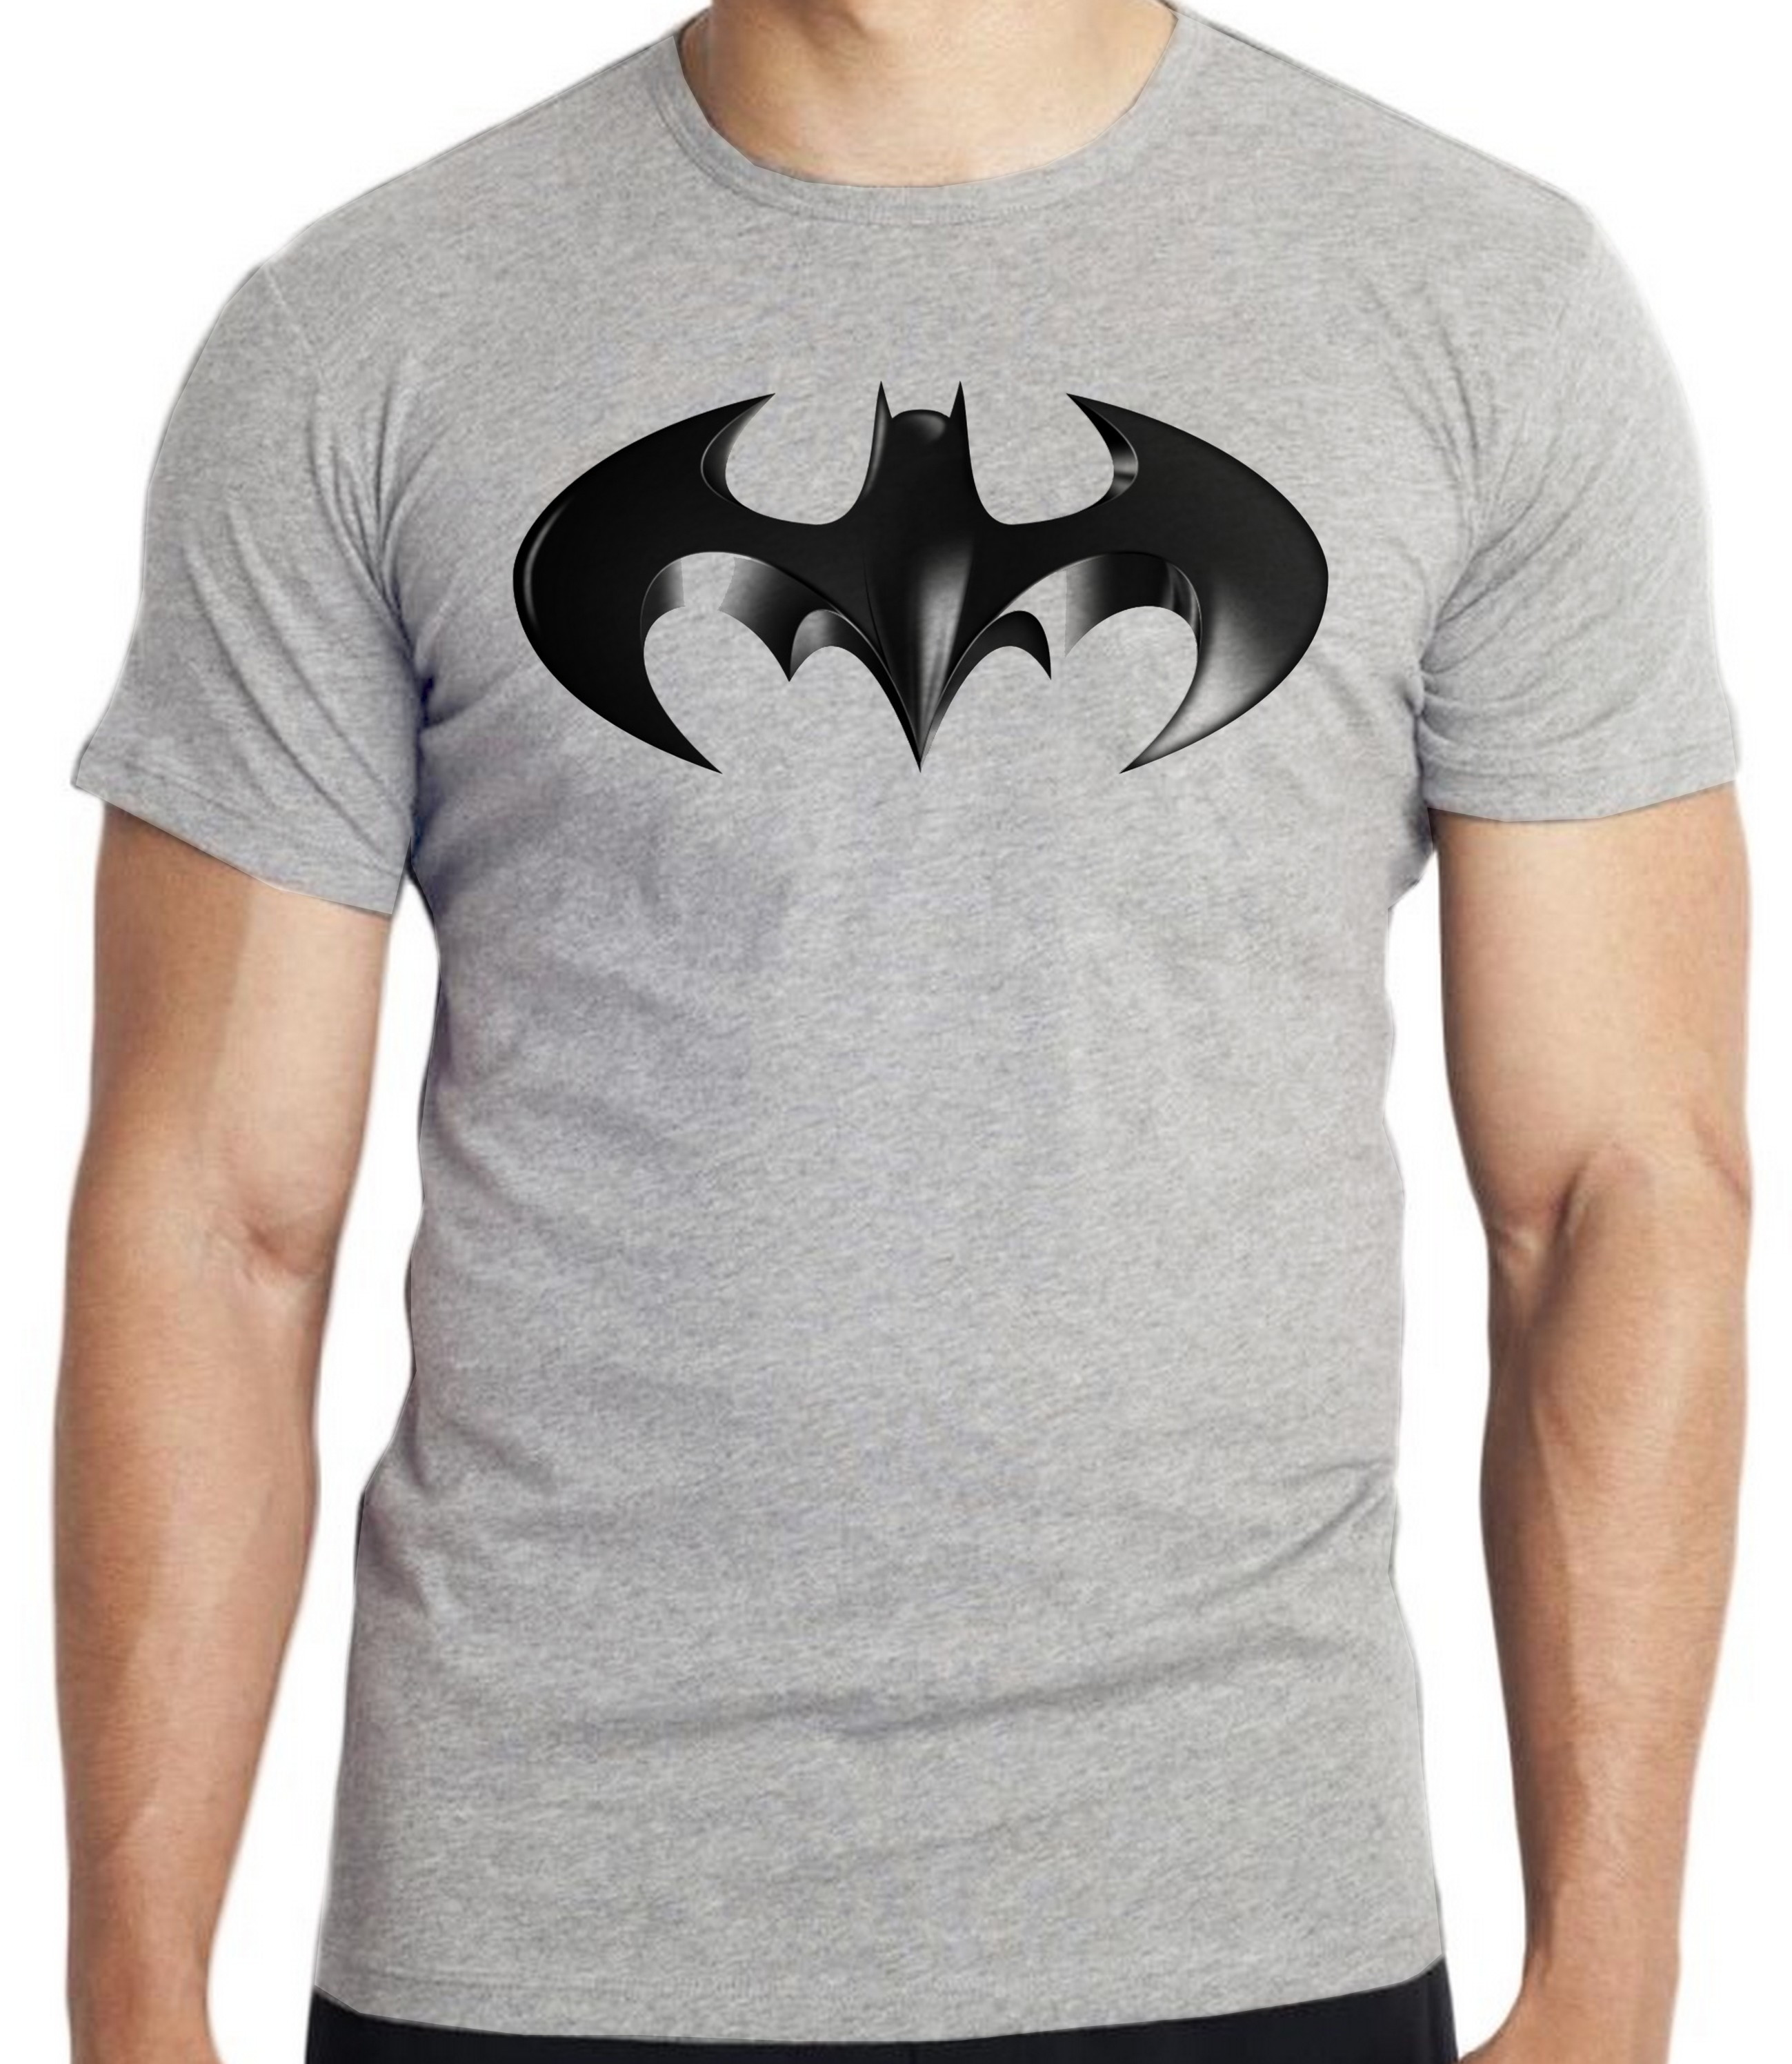 732c7100a Camiseta Liga da Justica Branca Masculina Adulto e Infantil